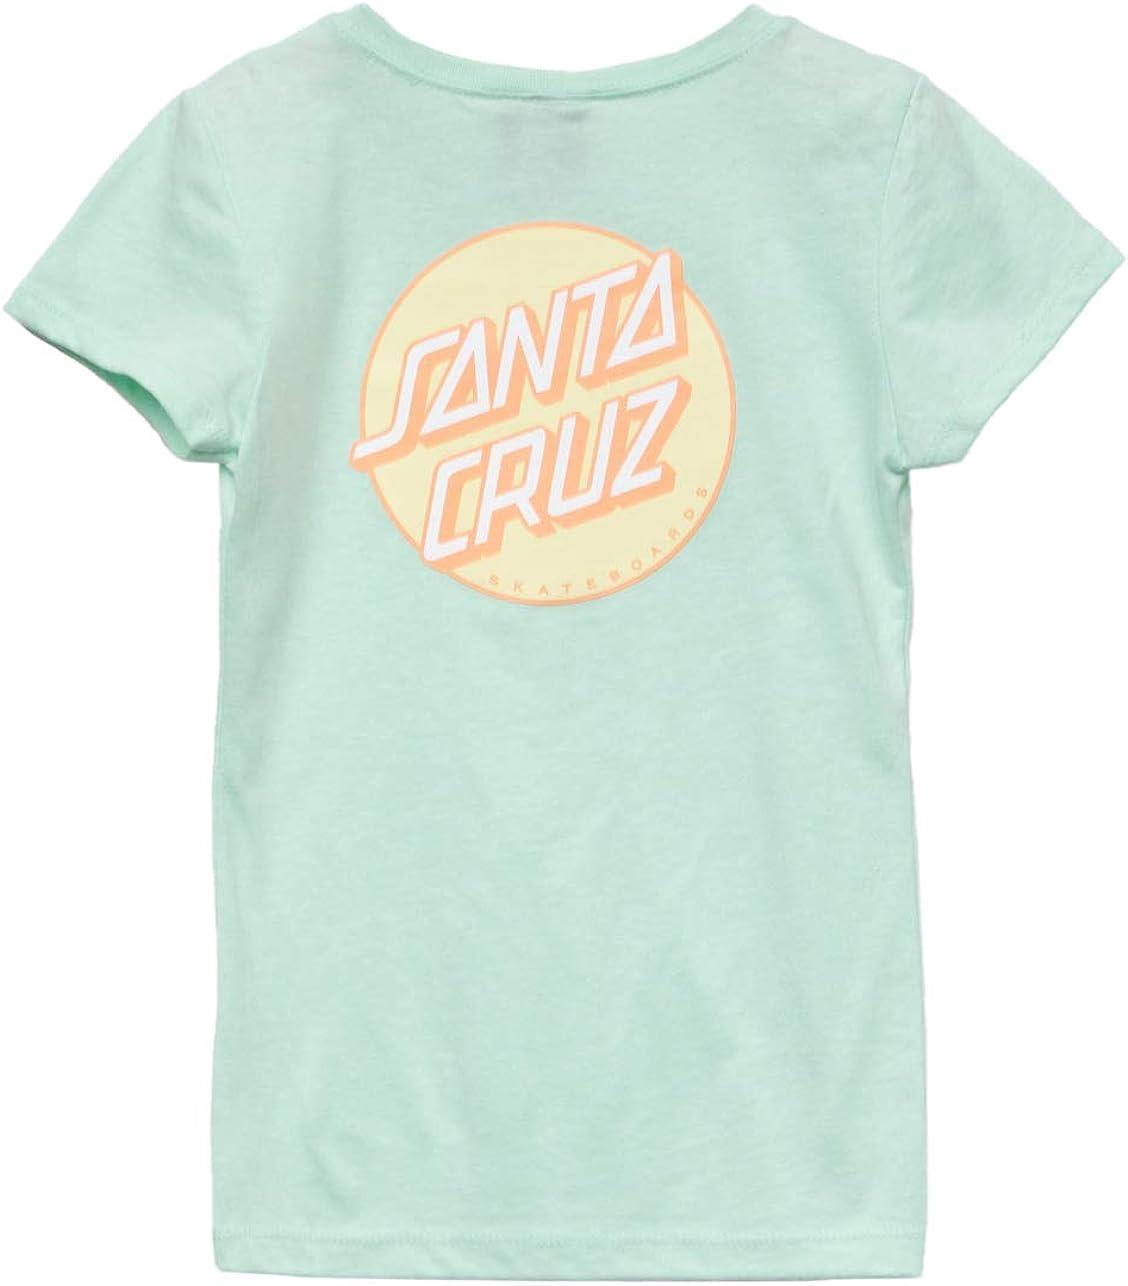 Santa Cruz Other Dot Fitted Girls T-Shirt Mint